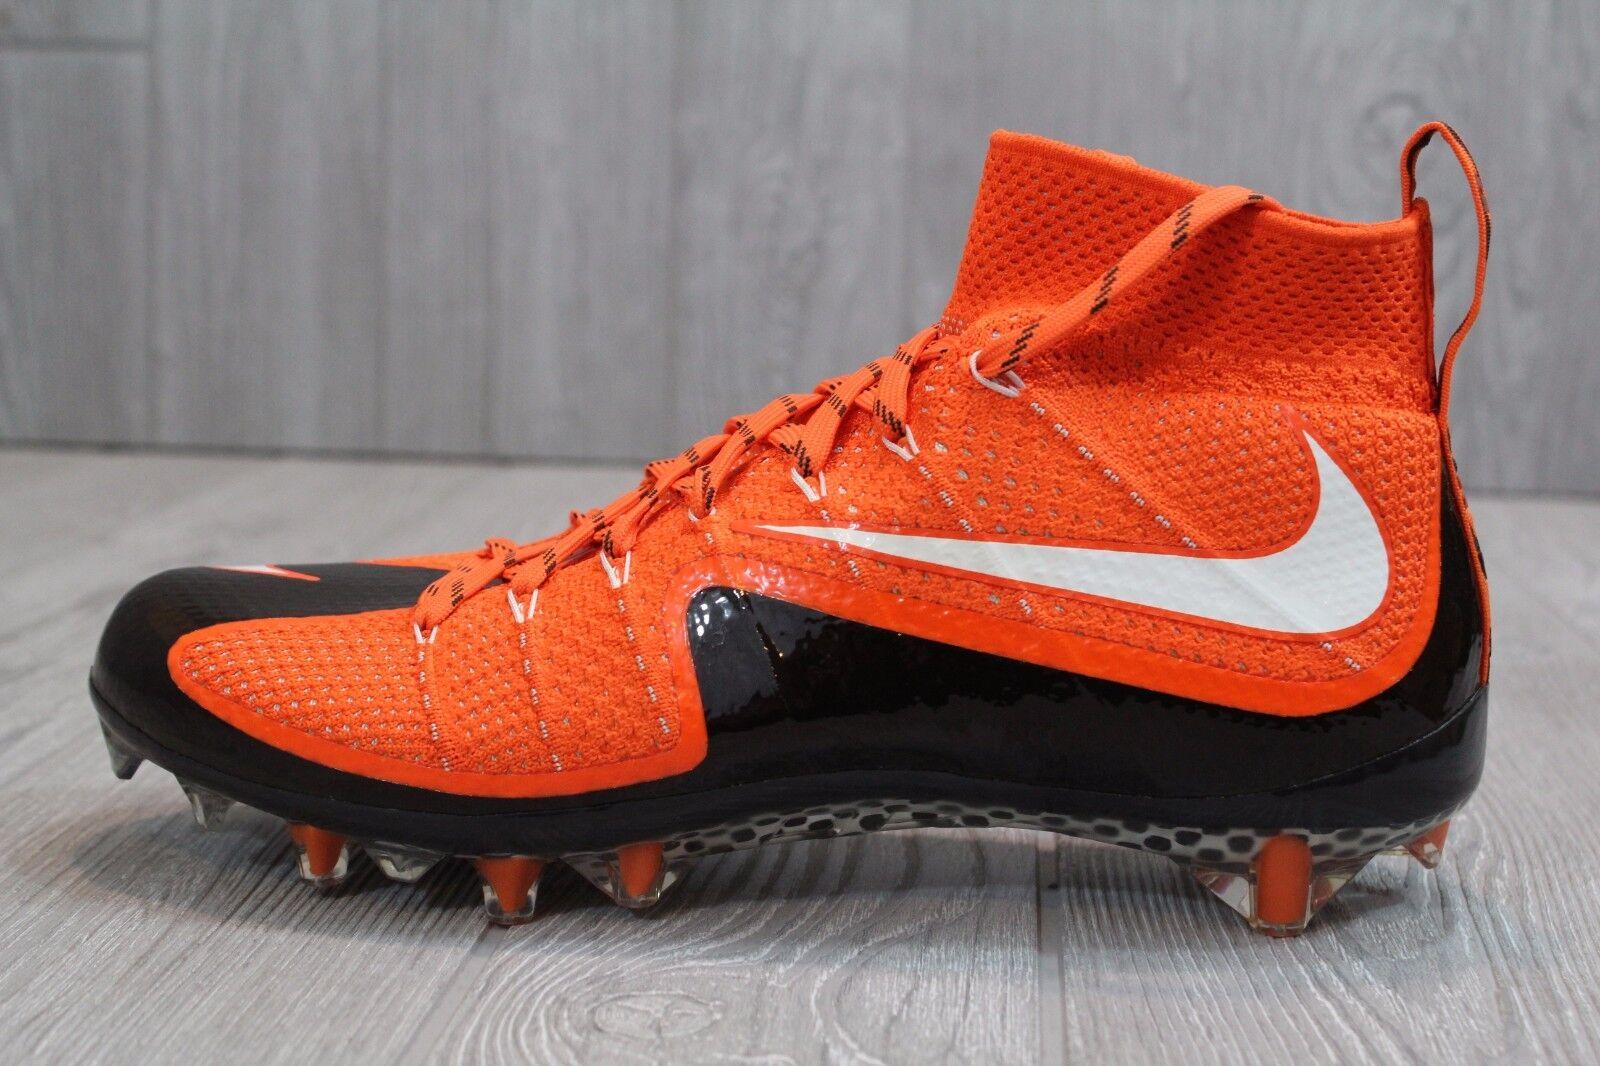 22 Nike Vapor Untouchable Football Cleats orange Black White SZ 9, 14 707455-808